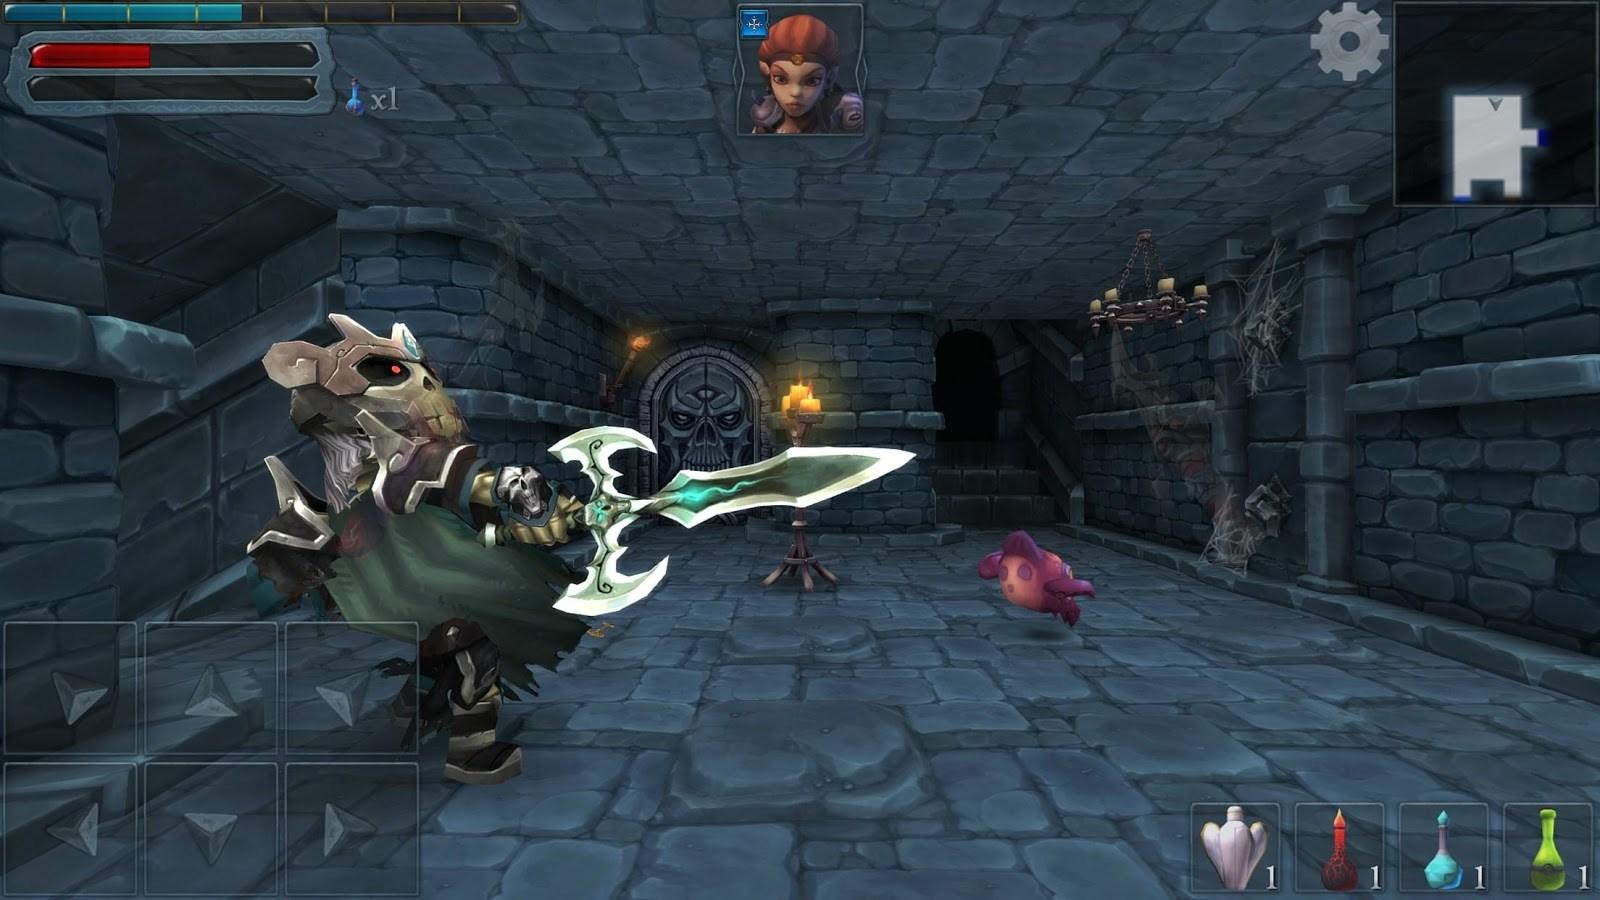 Dungeon Hero RPG - Imagem 1 do software